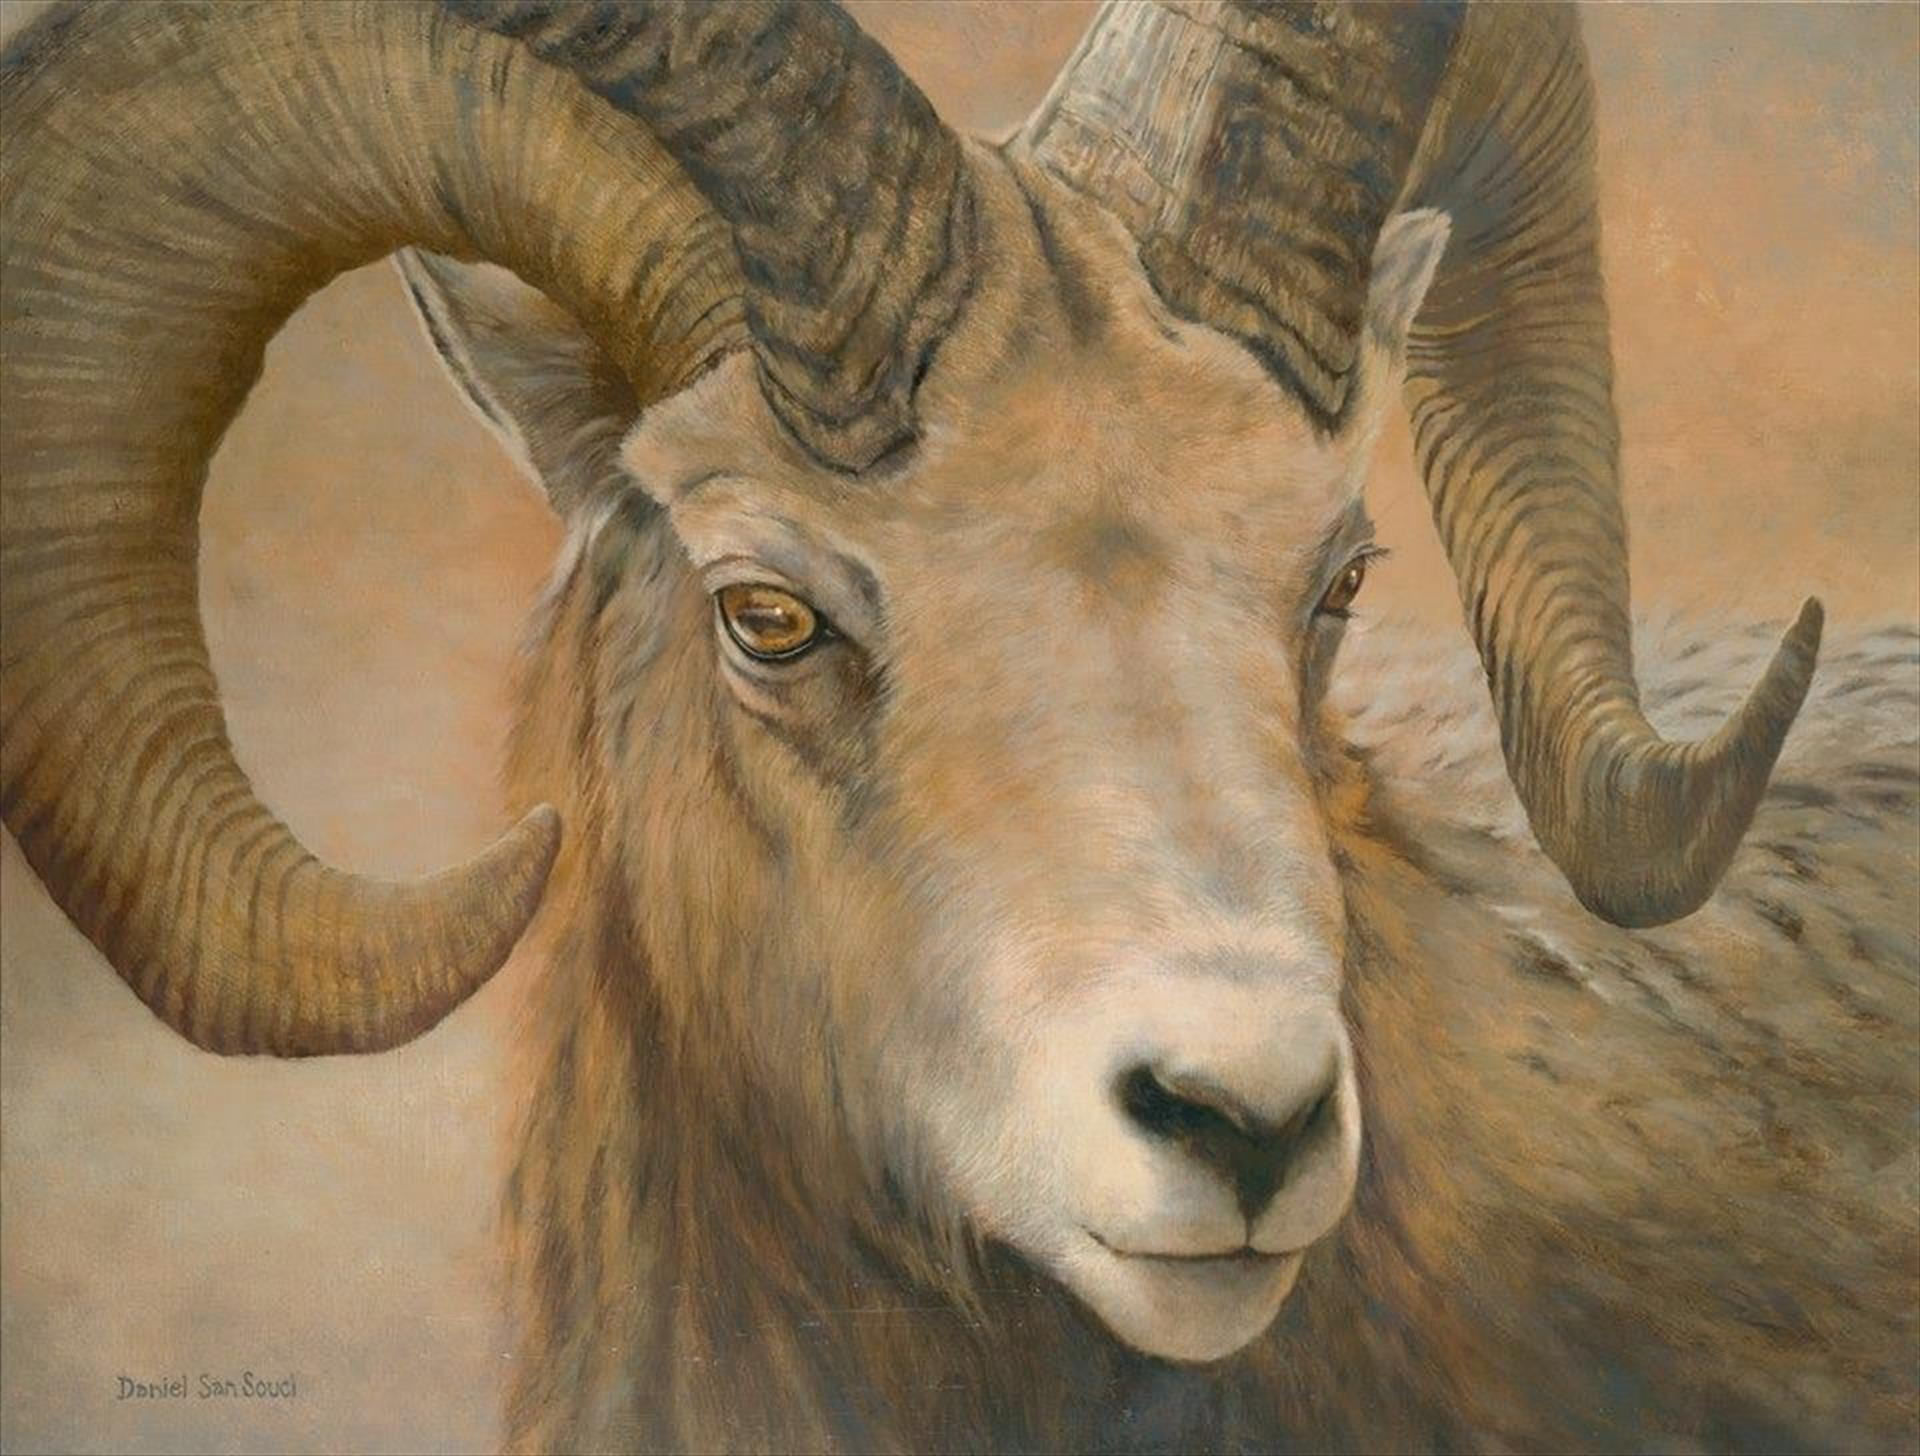 Big Horn, Daniel San Souci